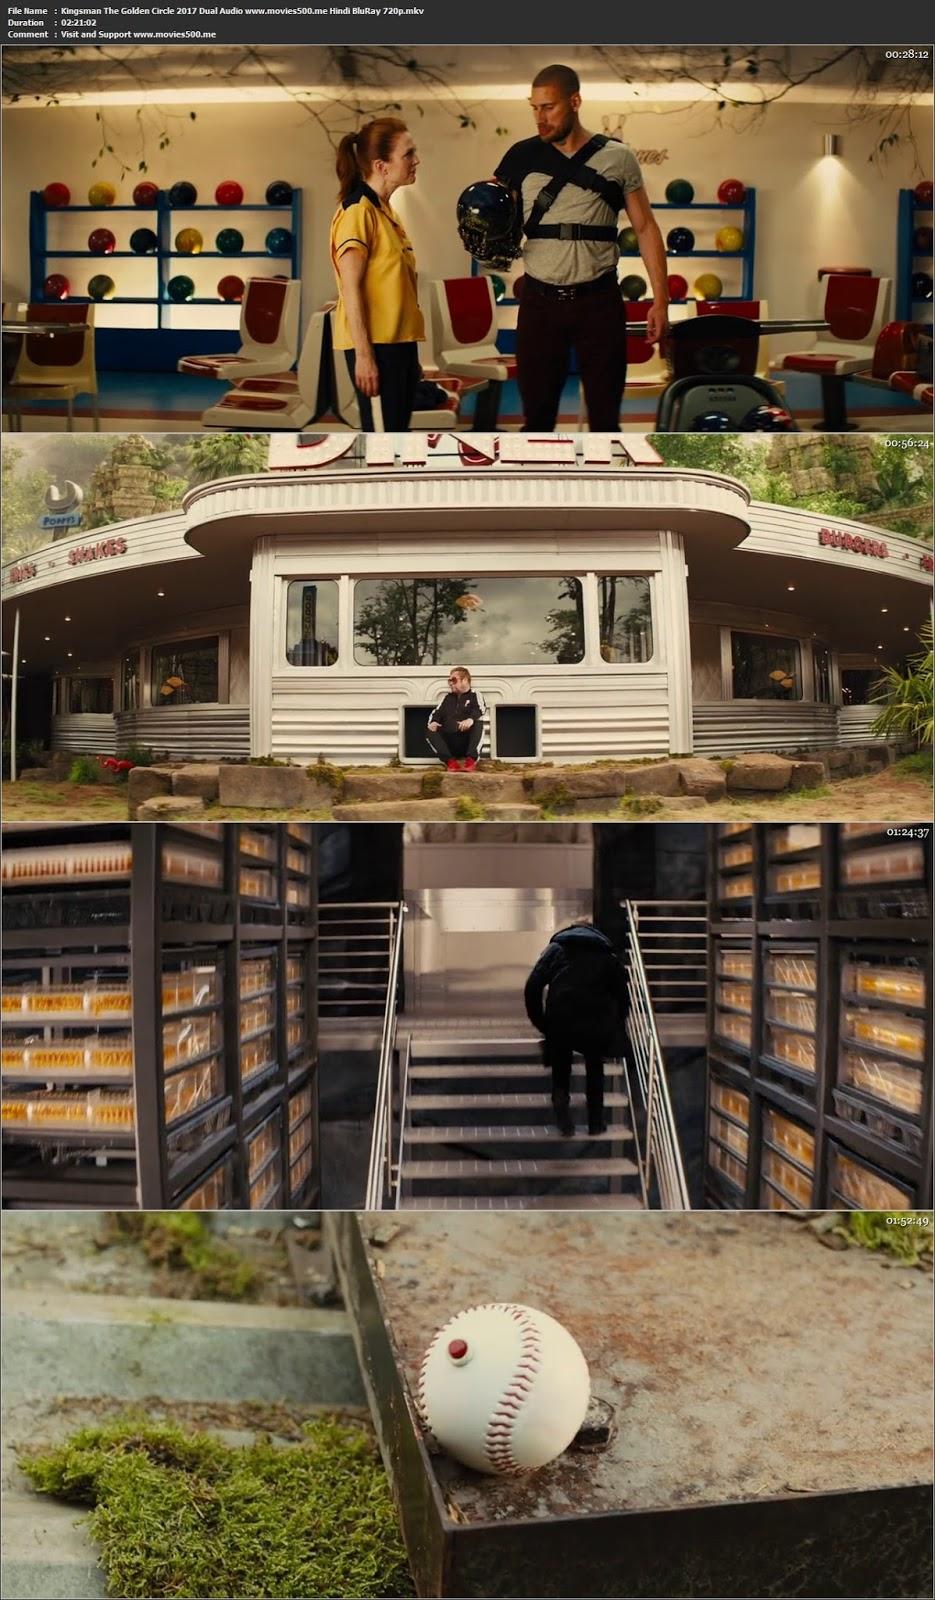 Kingsman The Golden Circle 2017 Dual Audio Hindi BluRay 720p 1.4GB at freedomcopy.com